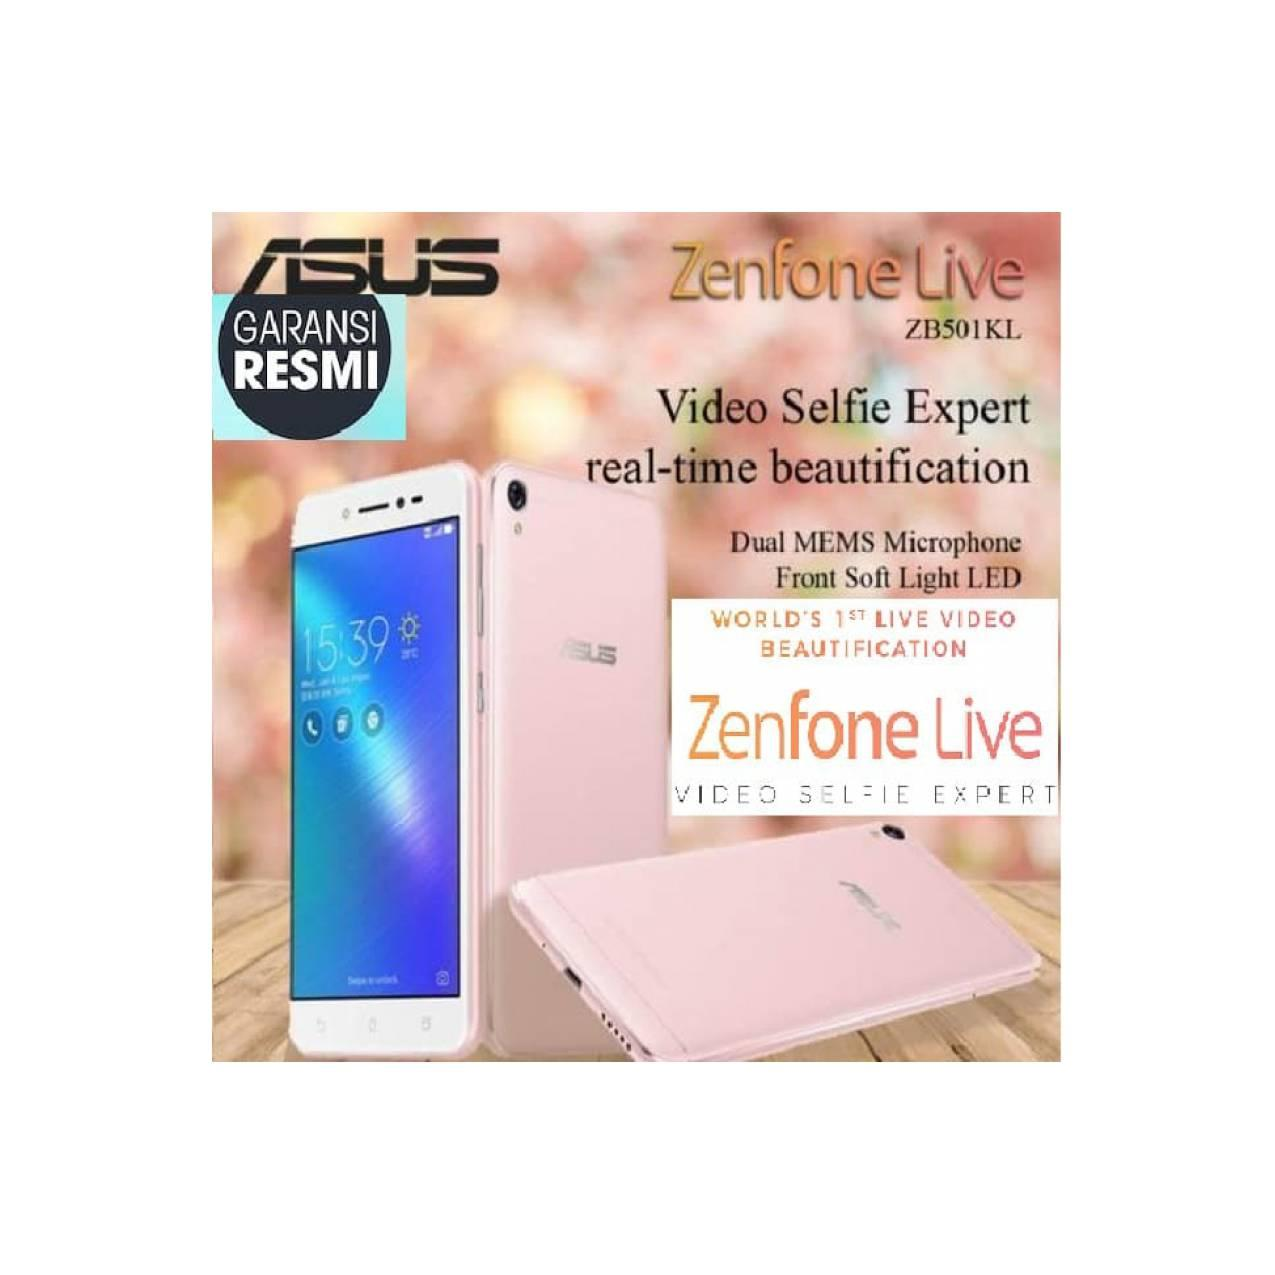 Asus Zenfone 3 Max Zc520tl 2gb 16gb Silver Garansi Resmi Free Grey 1 Tahun Hp Live Ram Emas